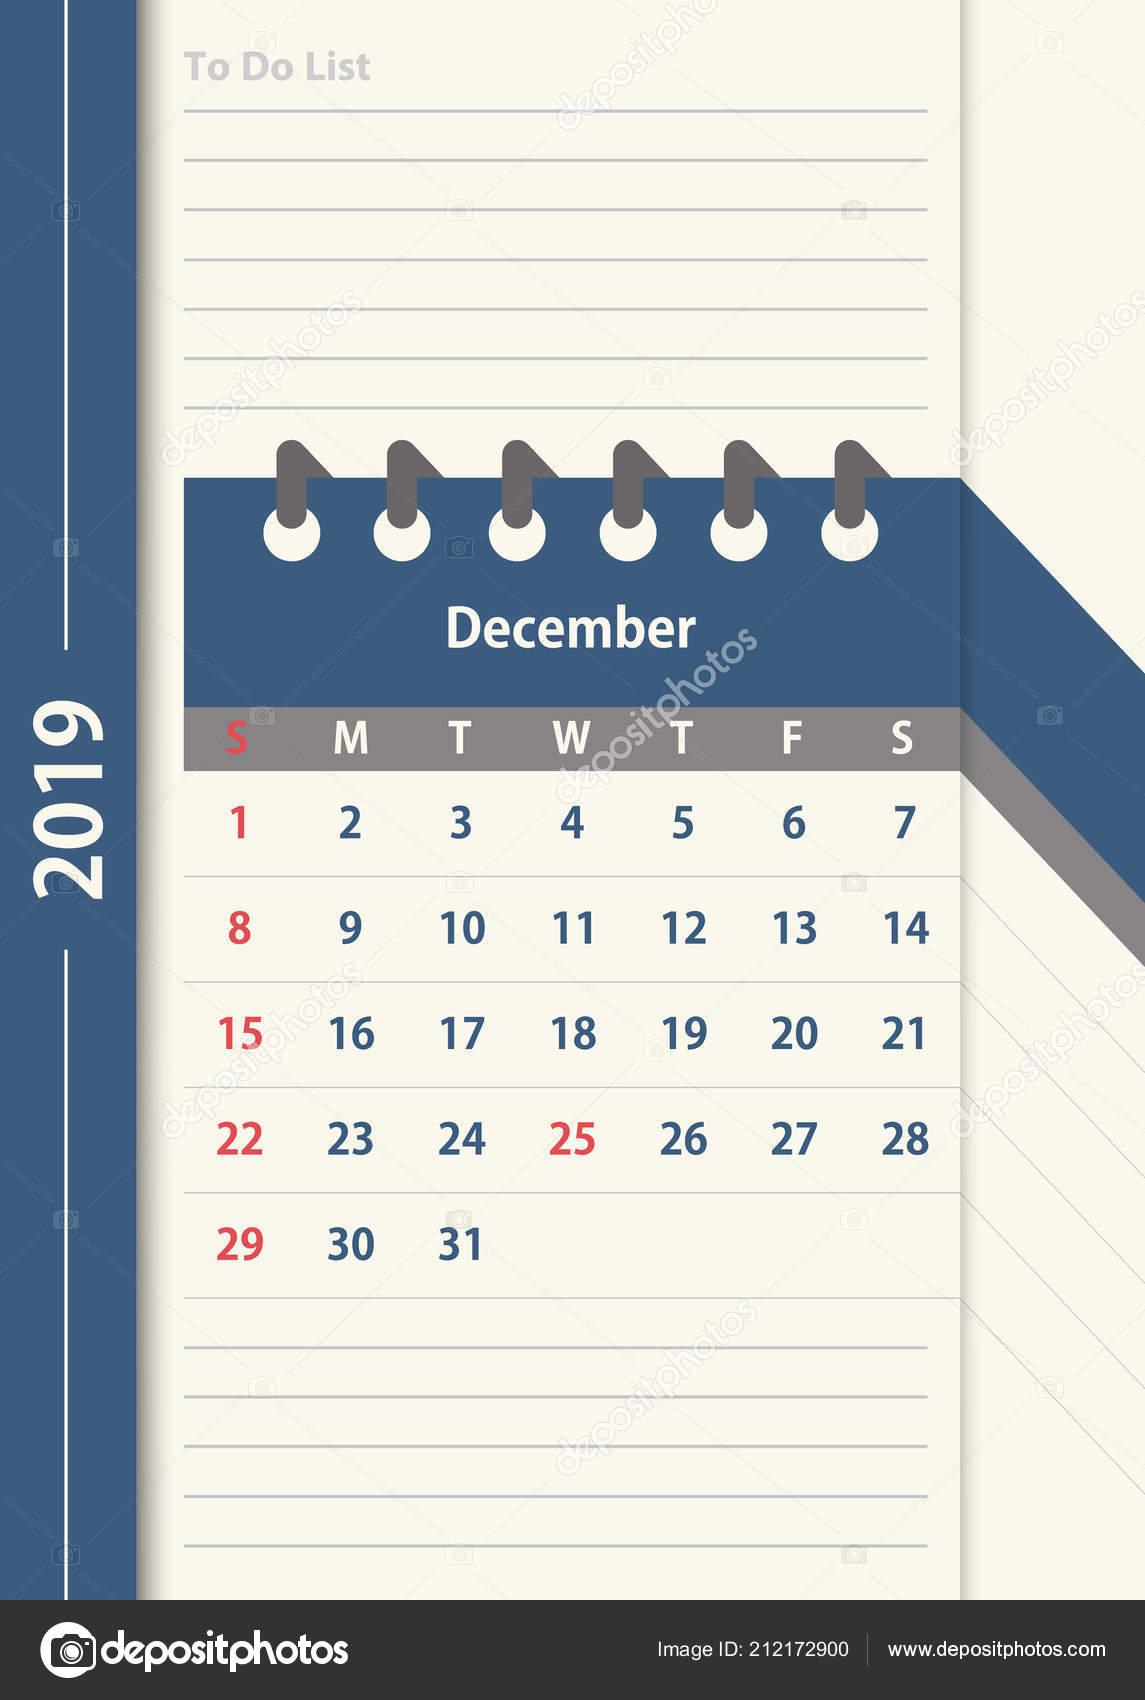 Calendario Mese Dicembre 2019.Calendario Dicembre 2019 Modello Progettazione Calendario